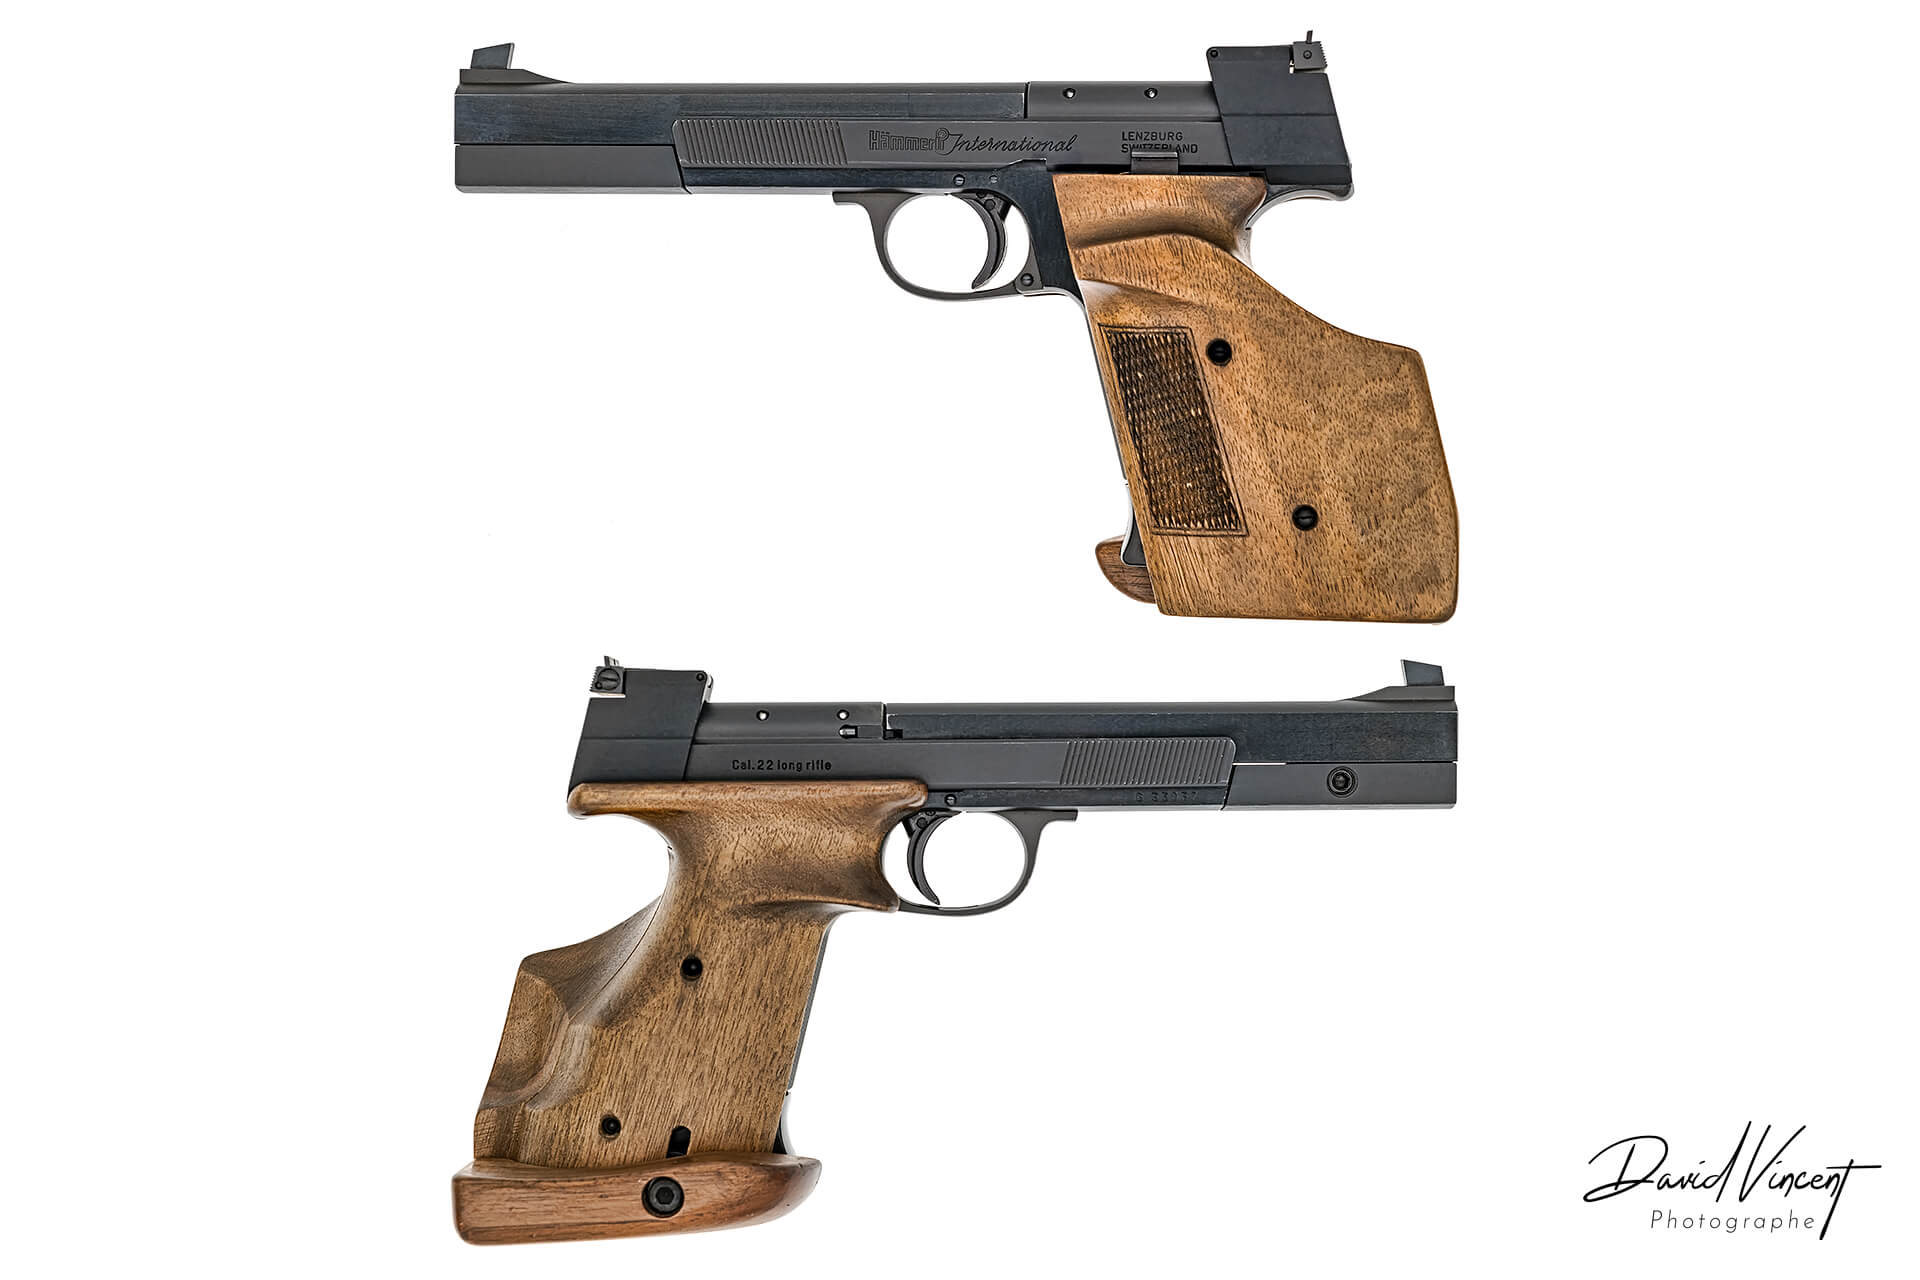 Hammerli 208 - Photographe d'armes à feu